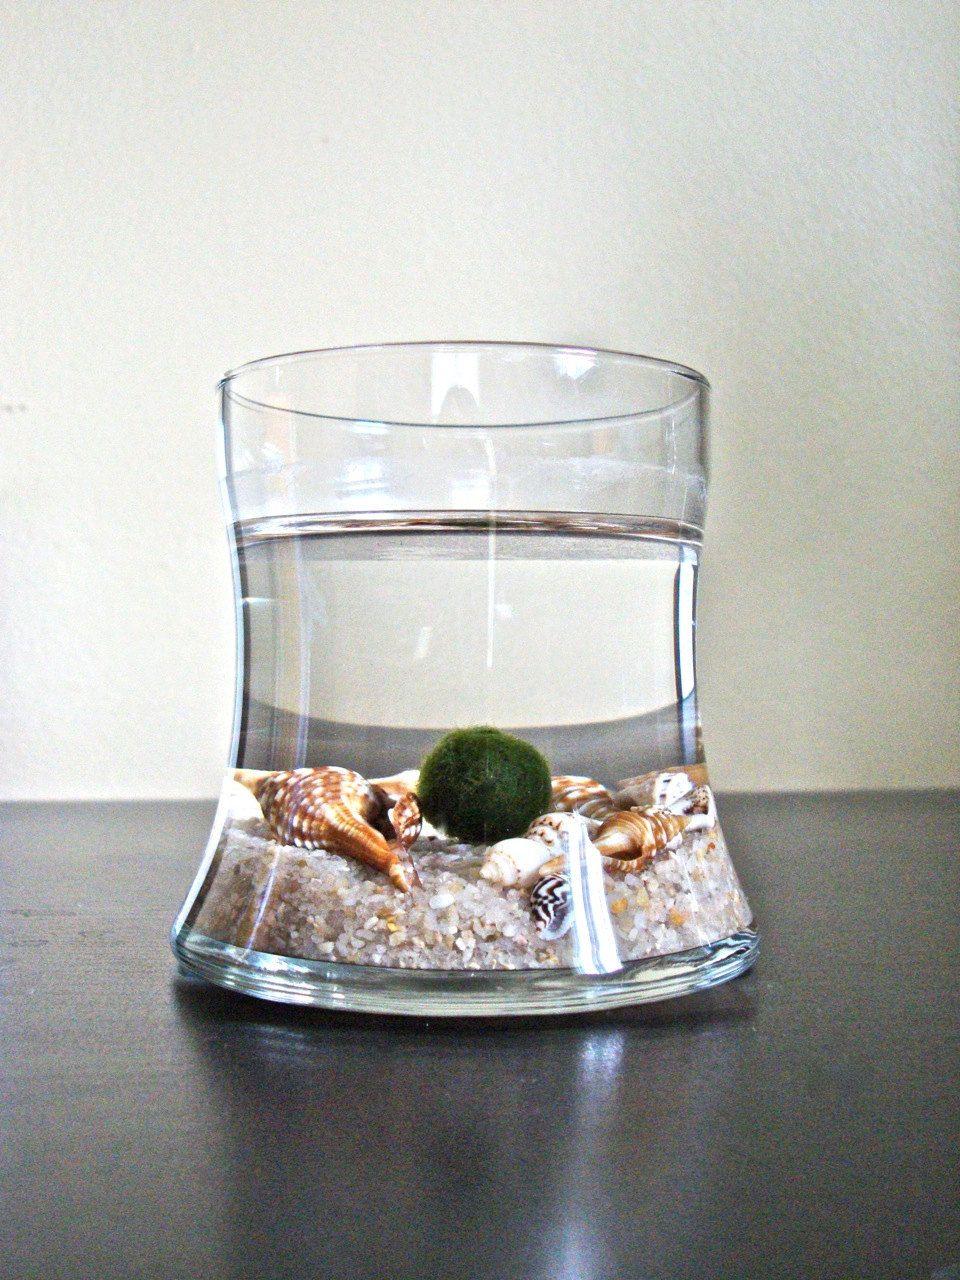 Japanese Marimo Pet Moss Ball Aquarium / Cute Aquarium